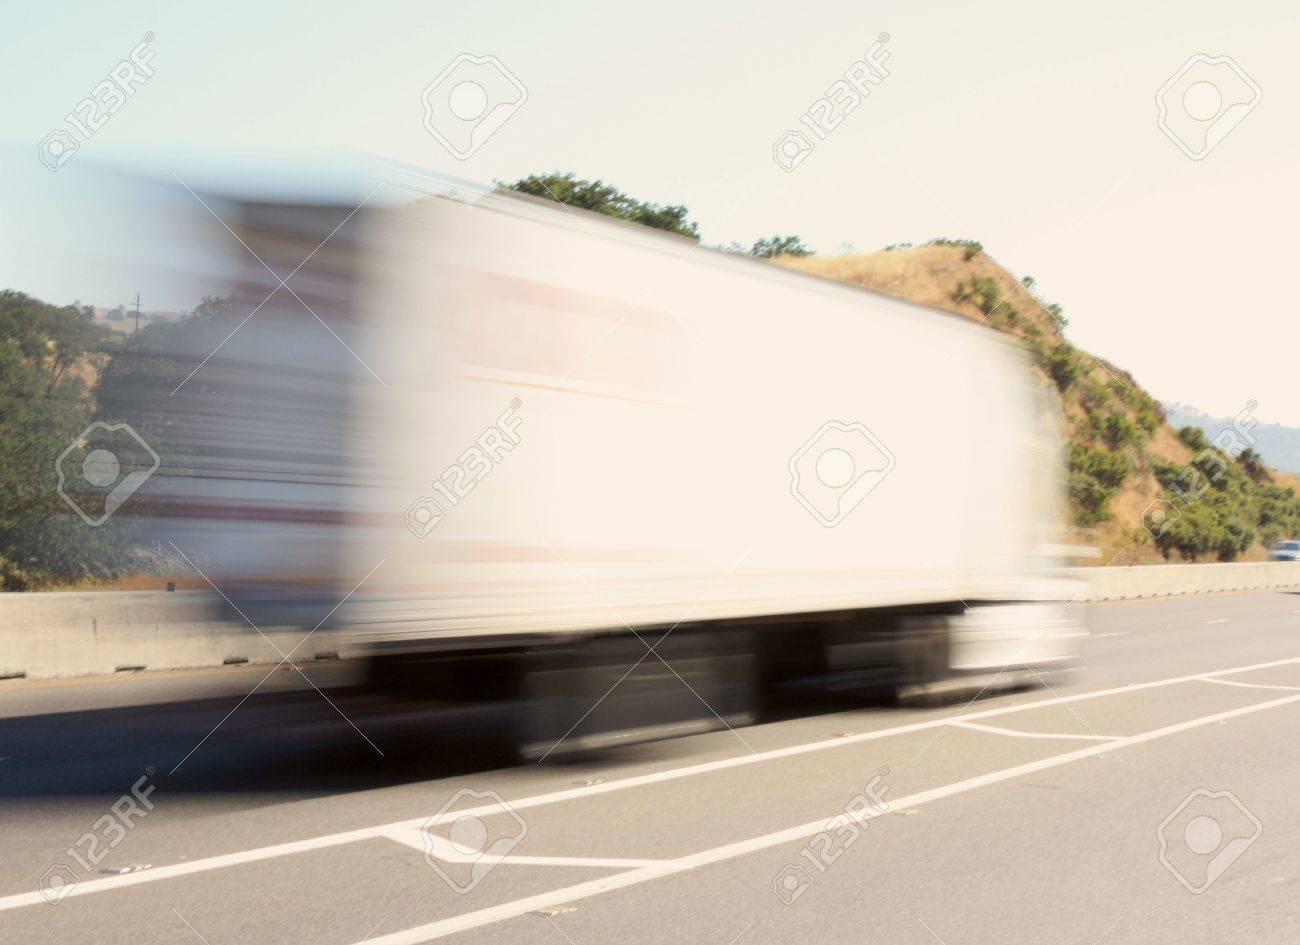 Speeding big truck Stock Photo - 7180360